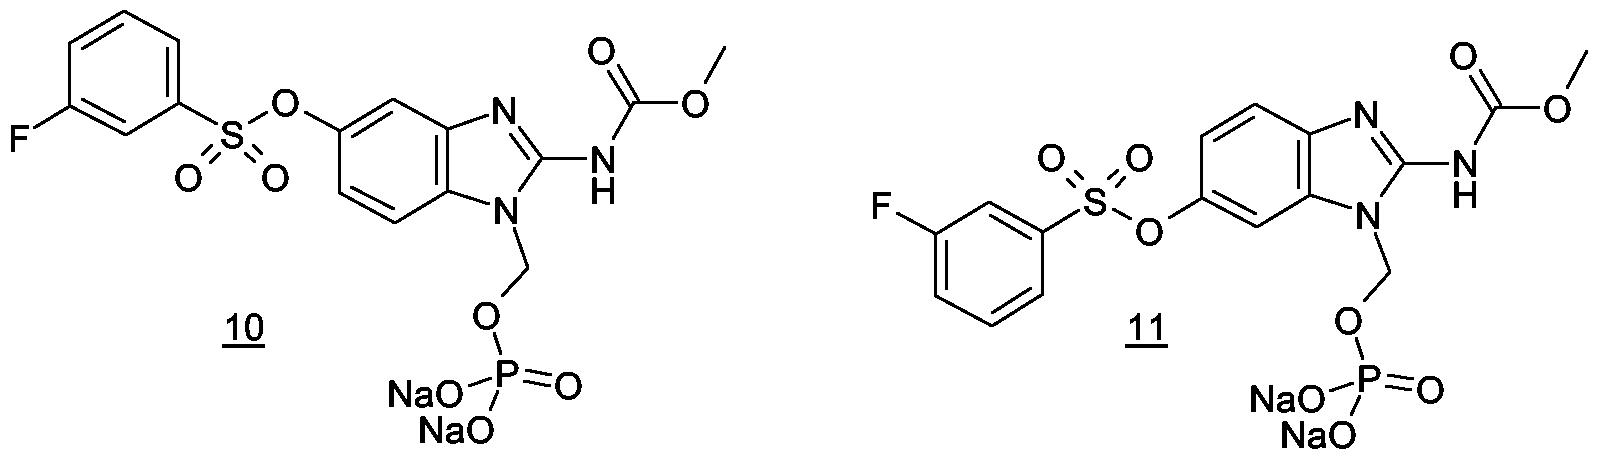 WO2007014846A1 - Novel benzimidazole (thio) carbamates with